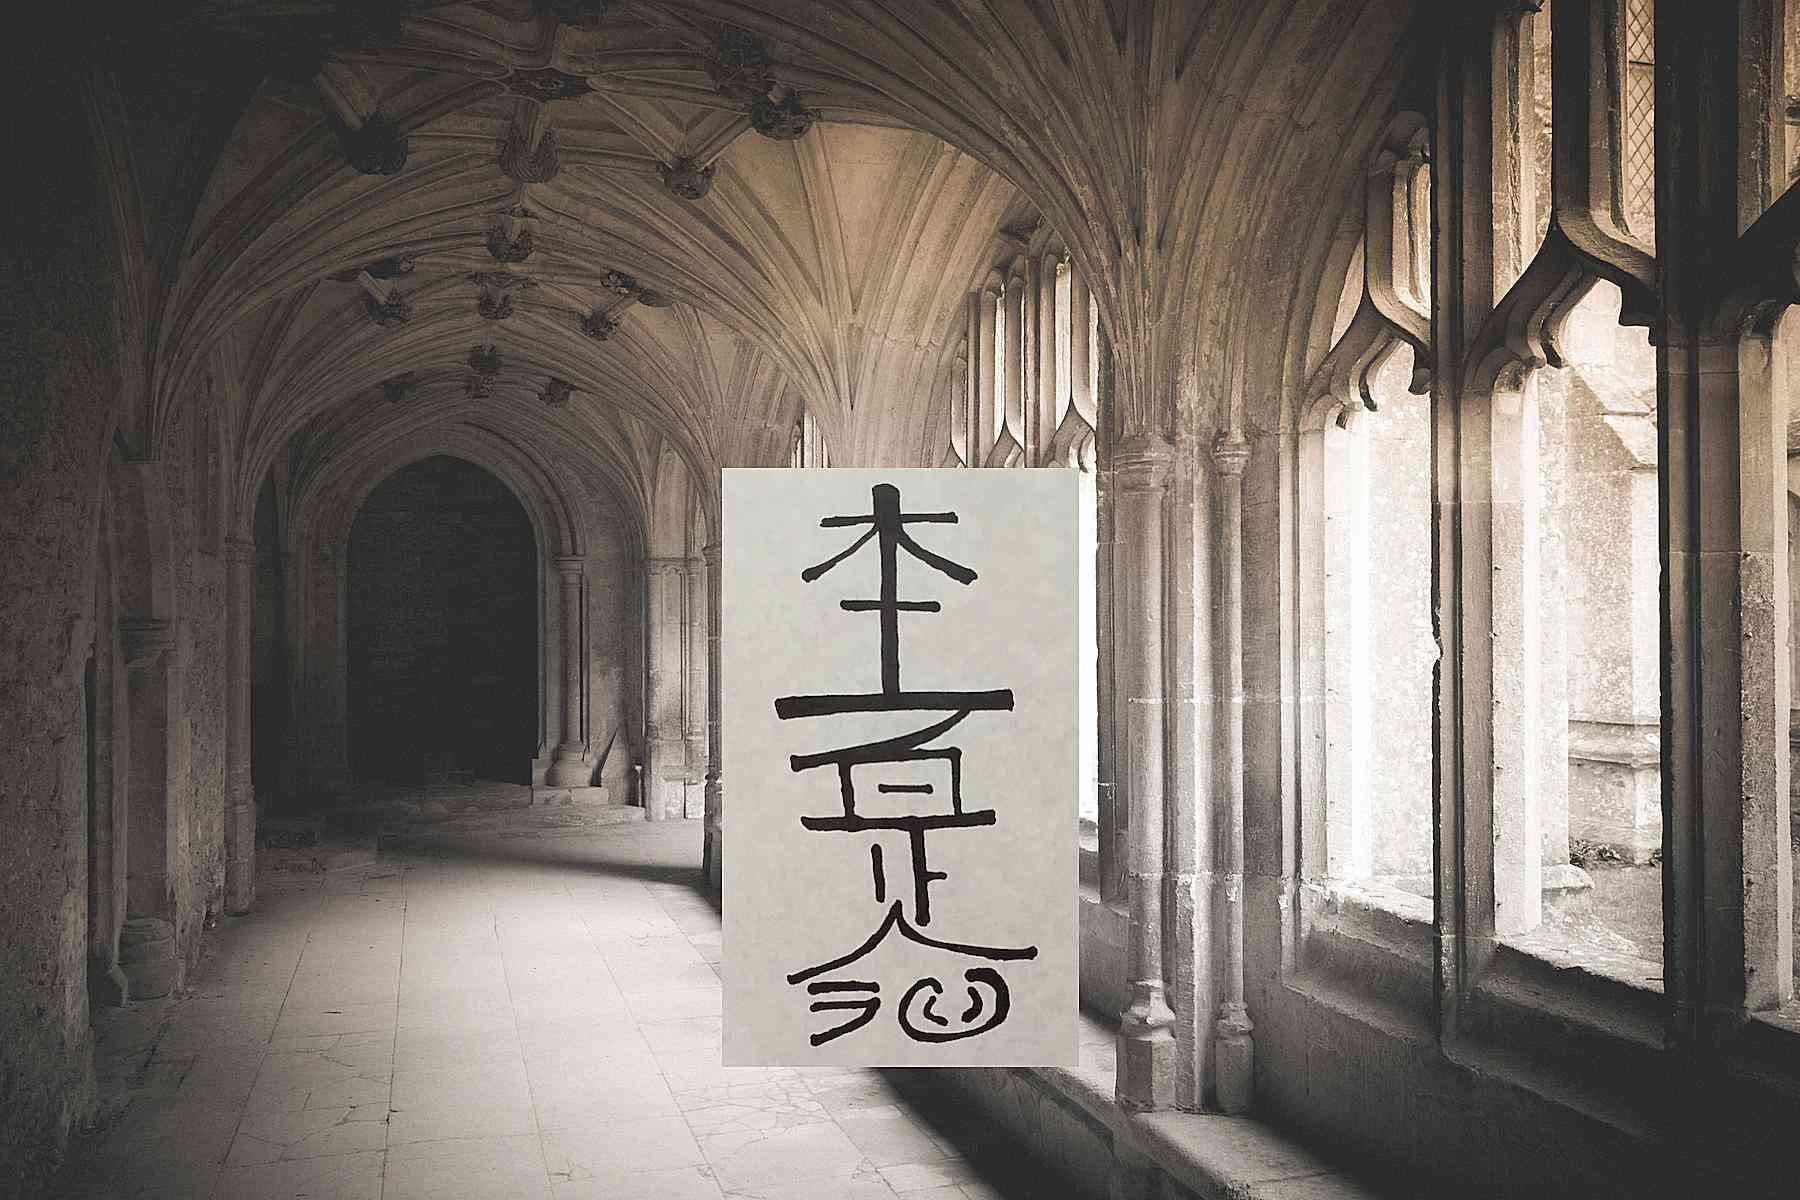 Hon Sha Ze Sha Nen Reiki Symbol